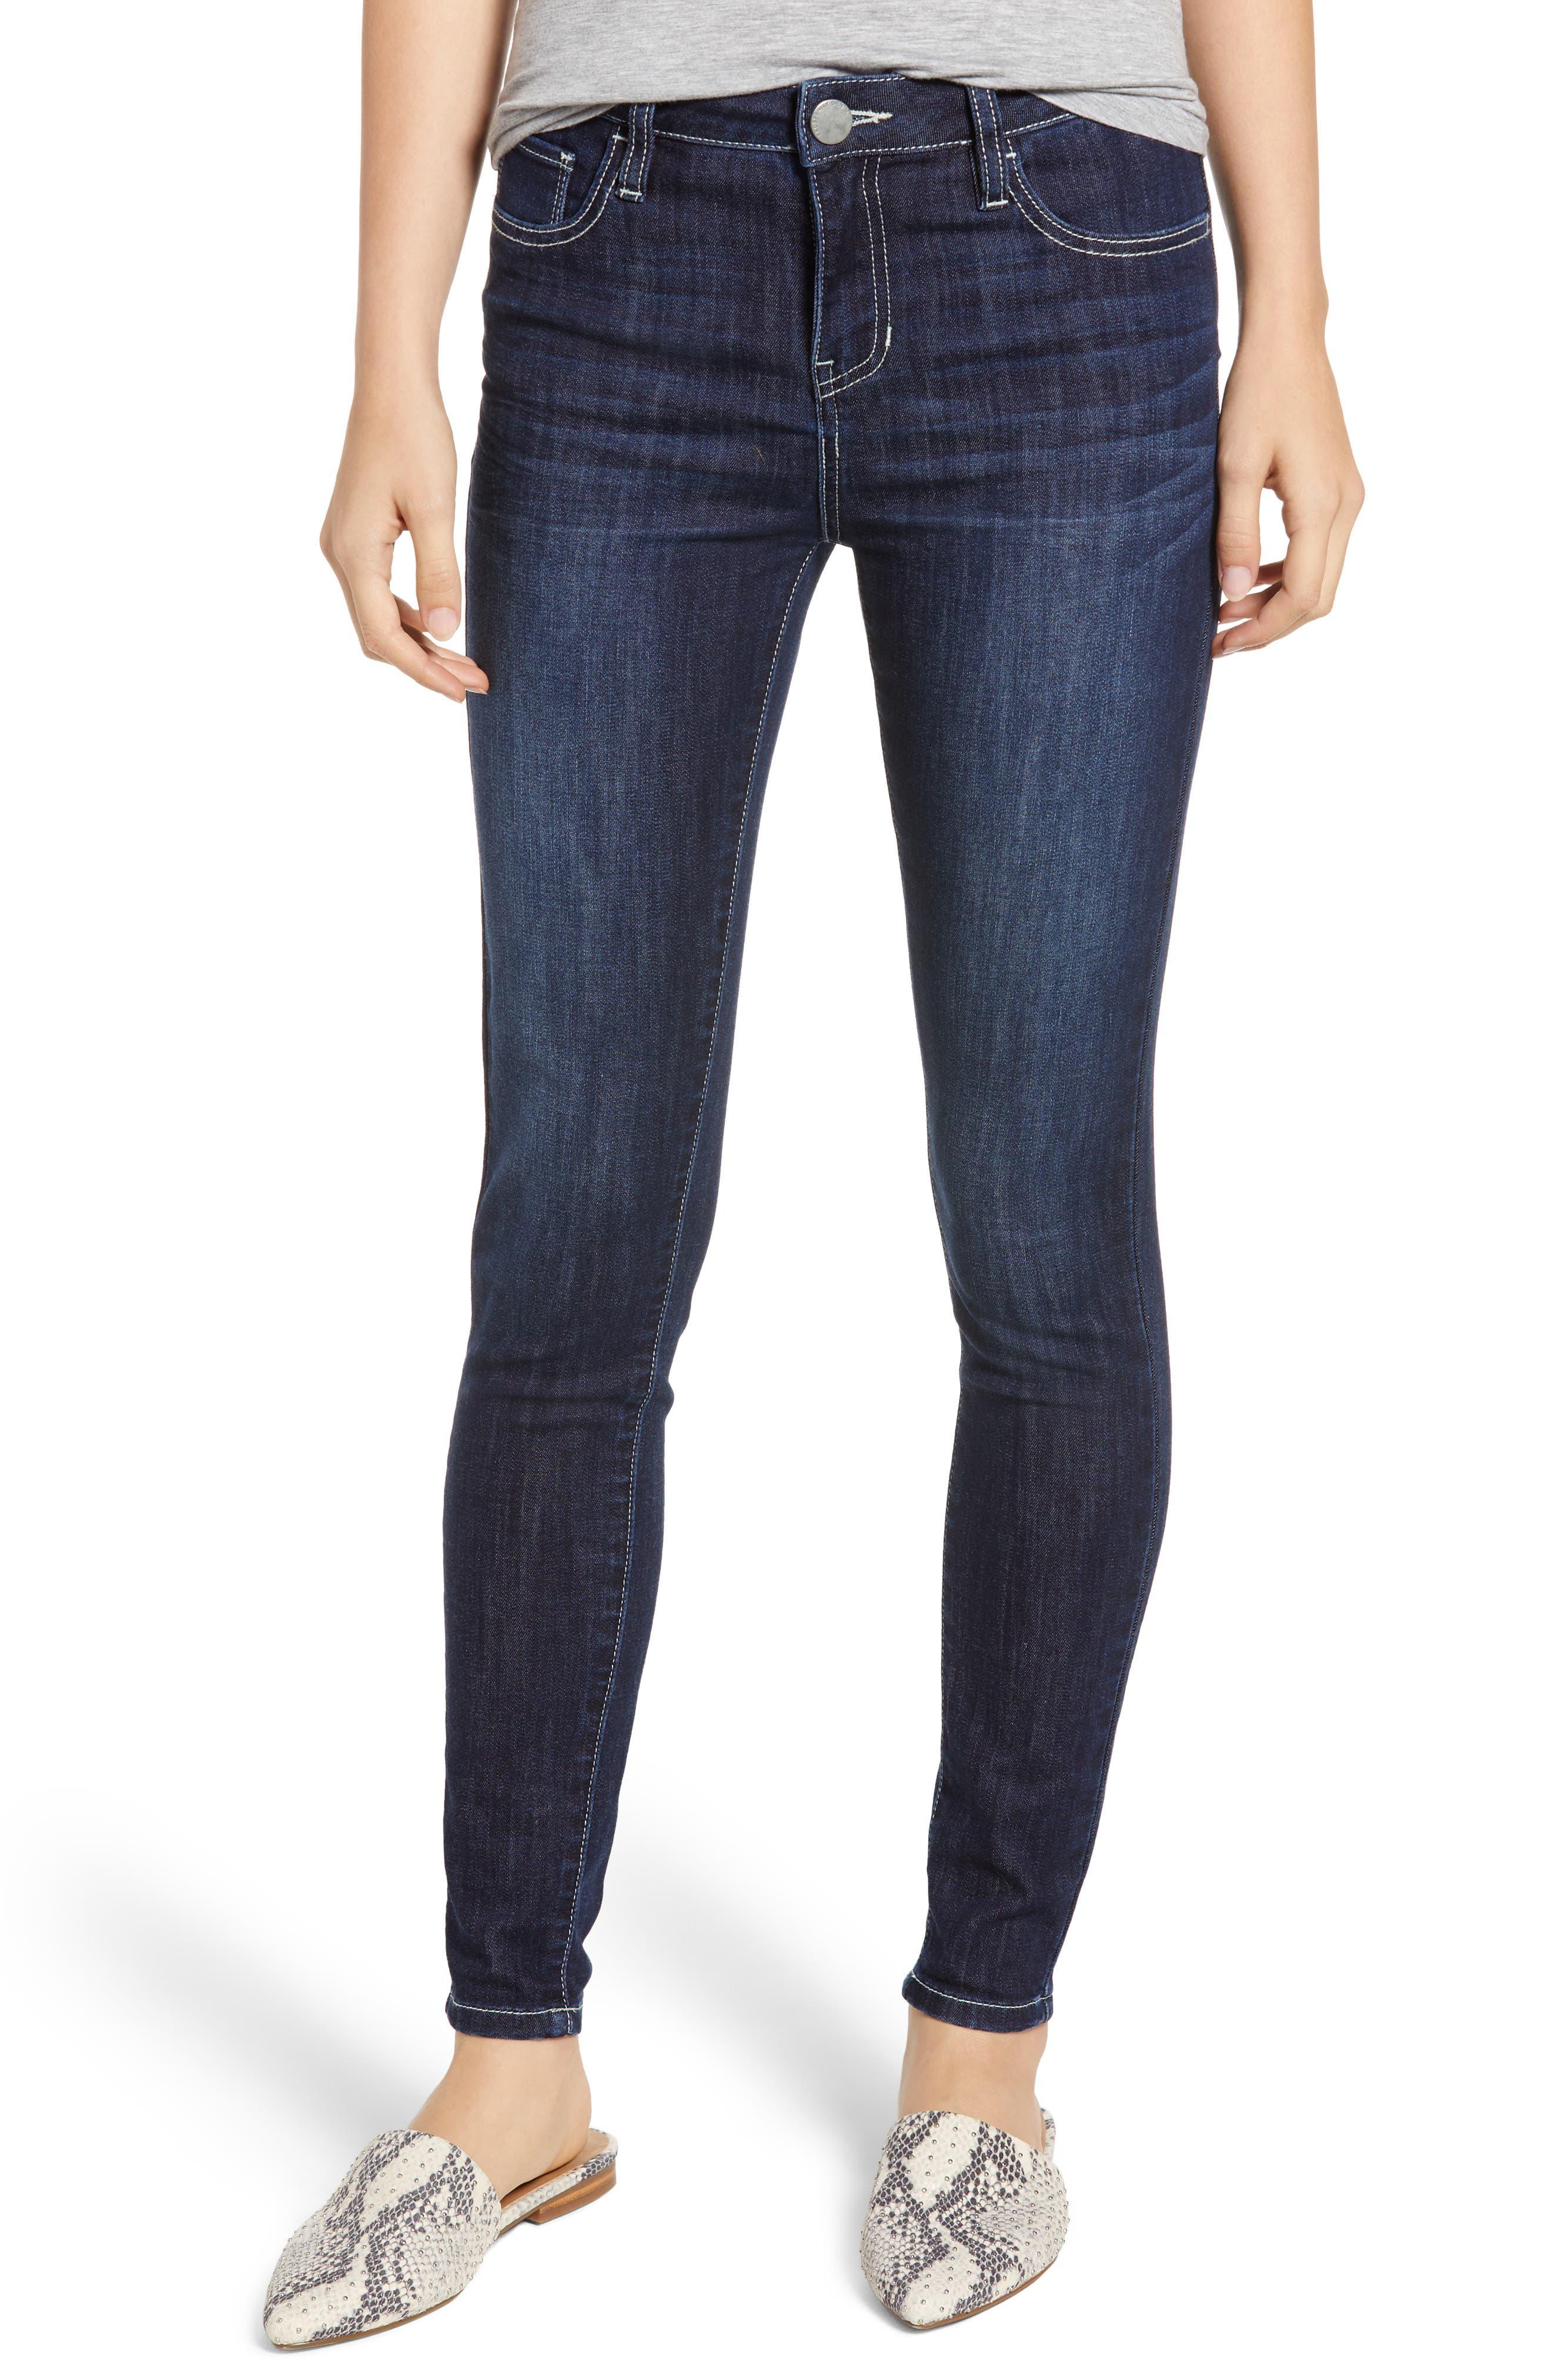 PROSPERITY DENIM Contrast Stitch Skinny Jeans, Main, color, DARK WASH